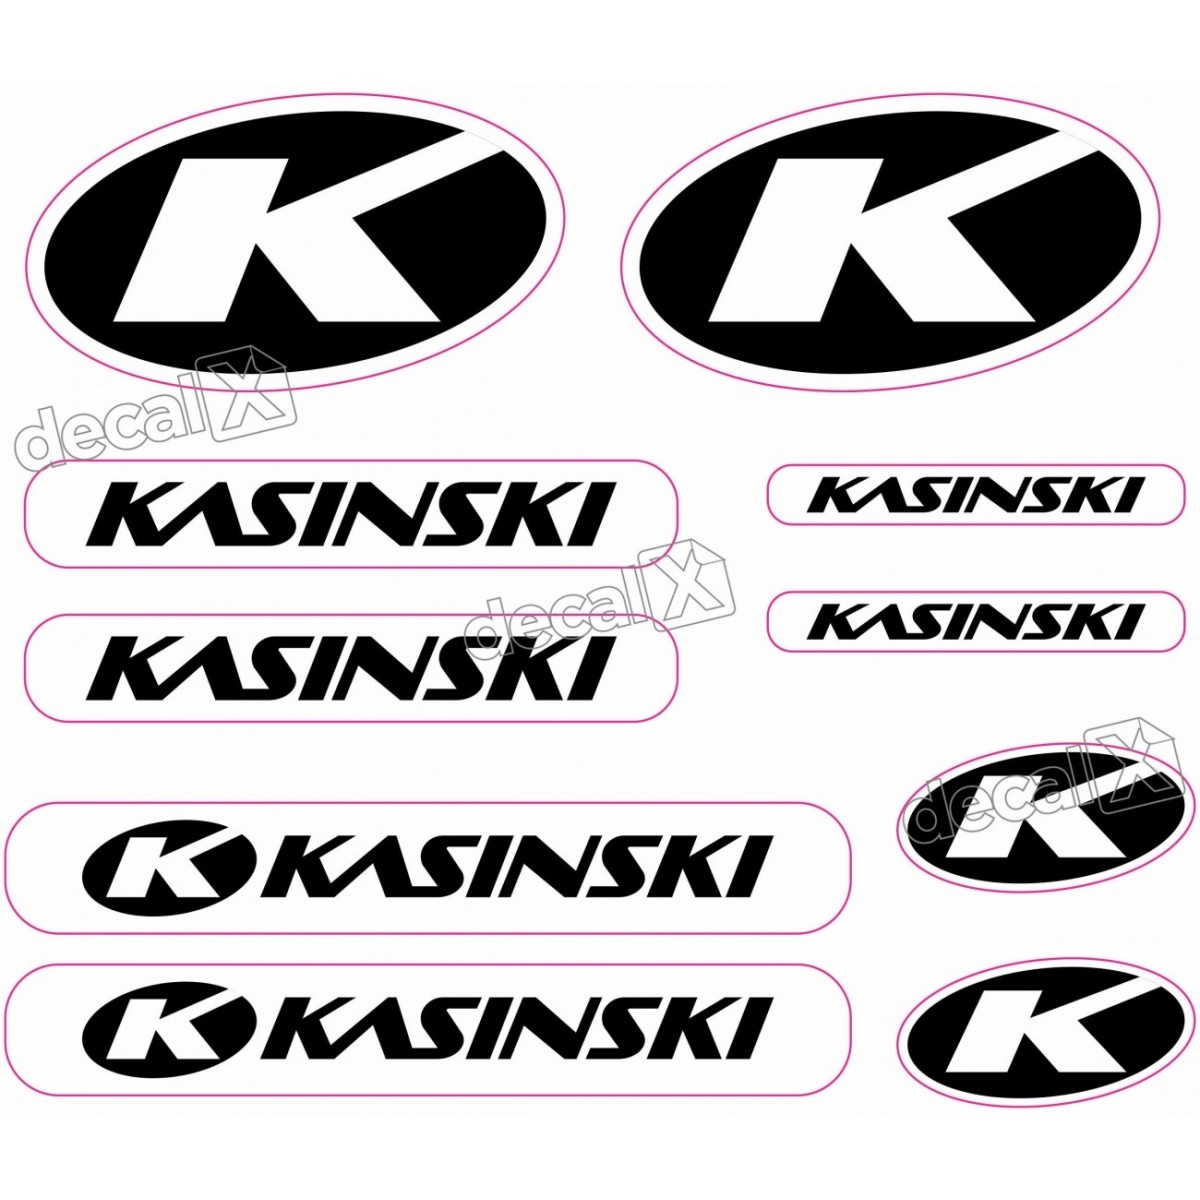 Kit Adesivos Capacete Kasinski Preto Refletivo Ktcp70 Decalx